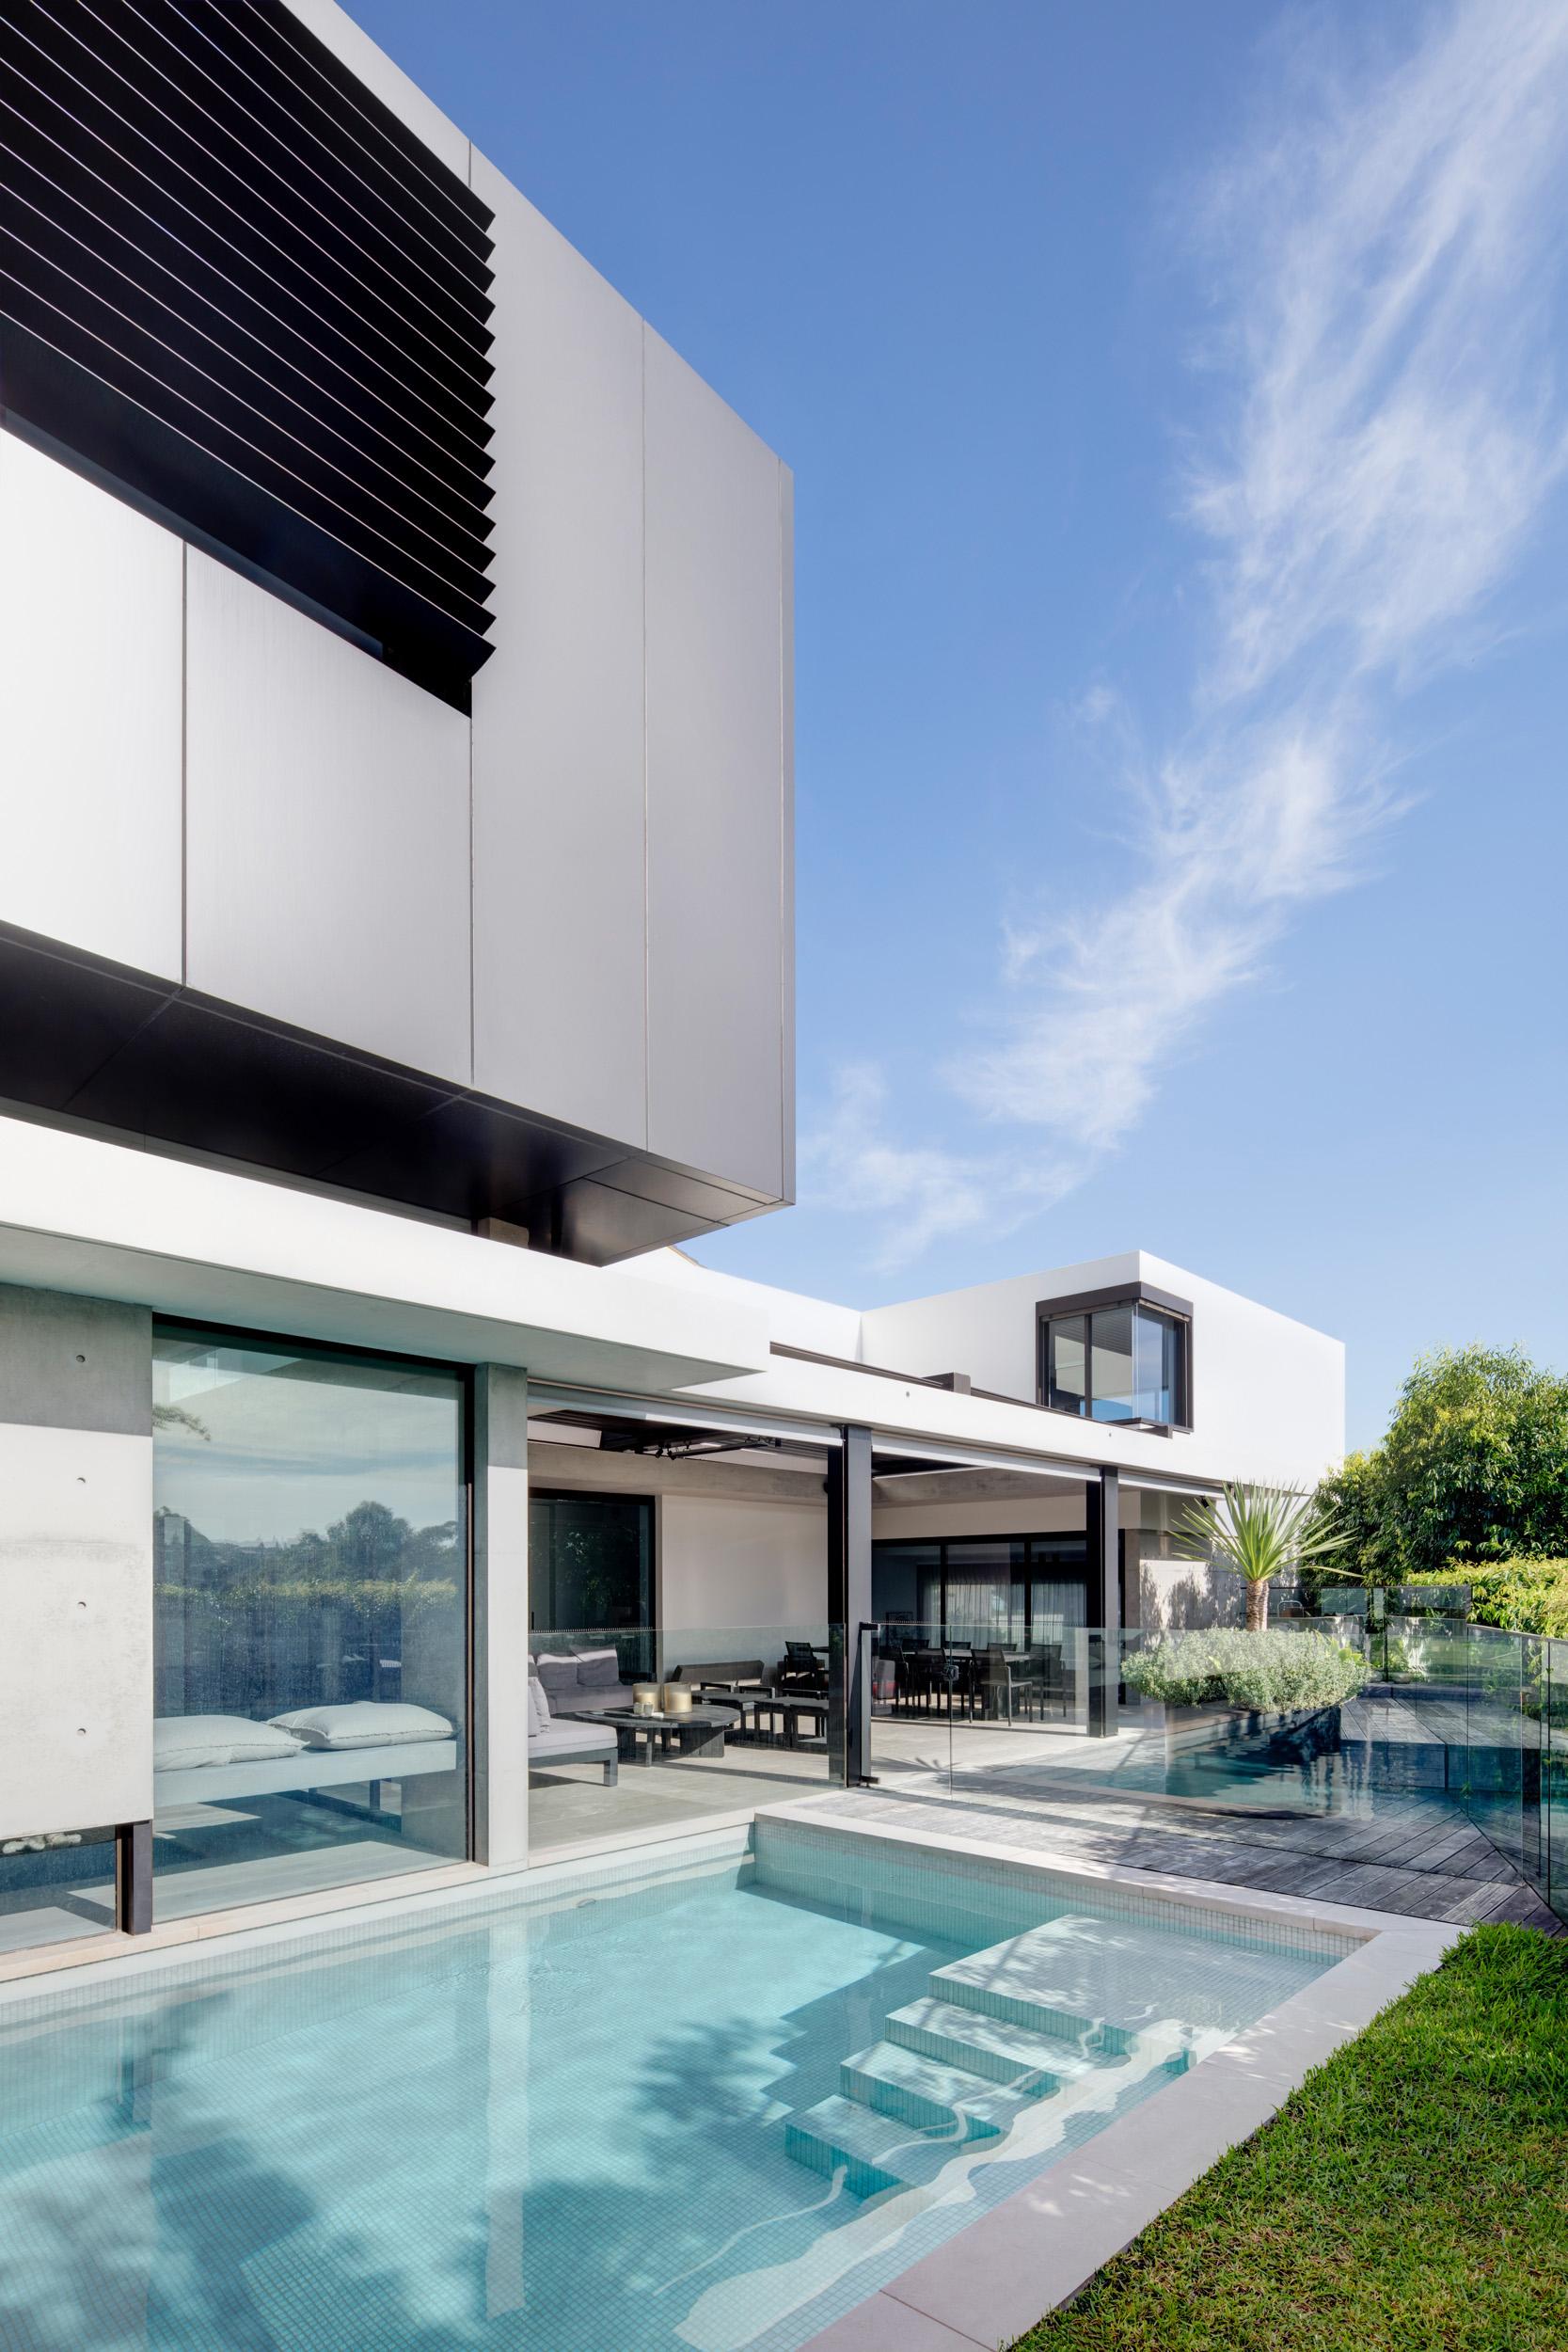 Jem_Cresswell_Architecture_Residential_Photographer_Sydney_Australia_035.jpg